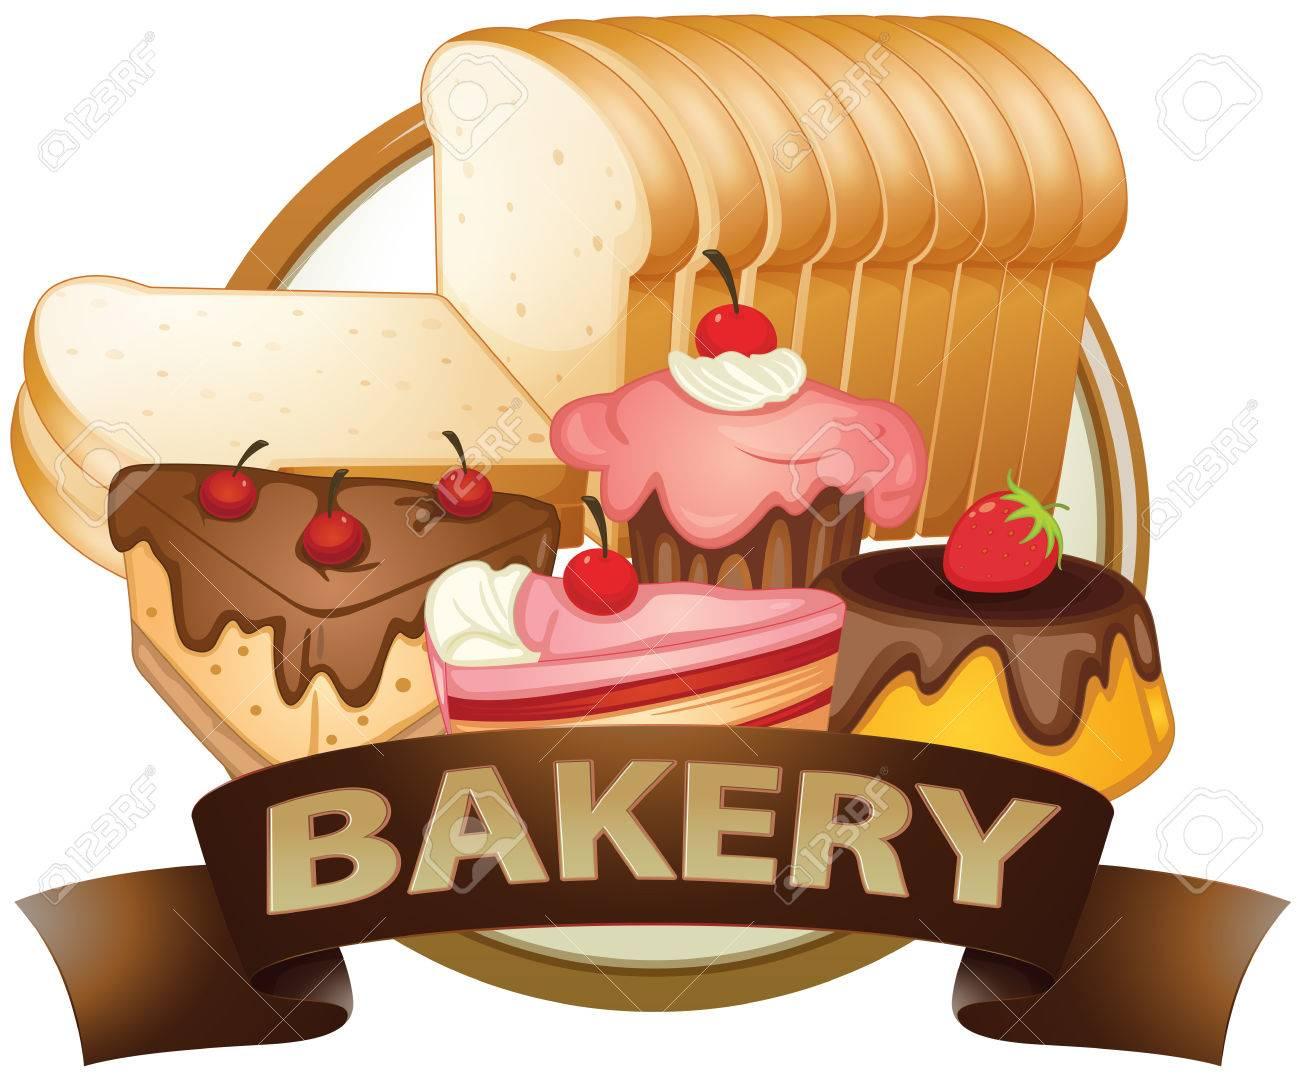 1500 Bakery free clipart.